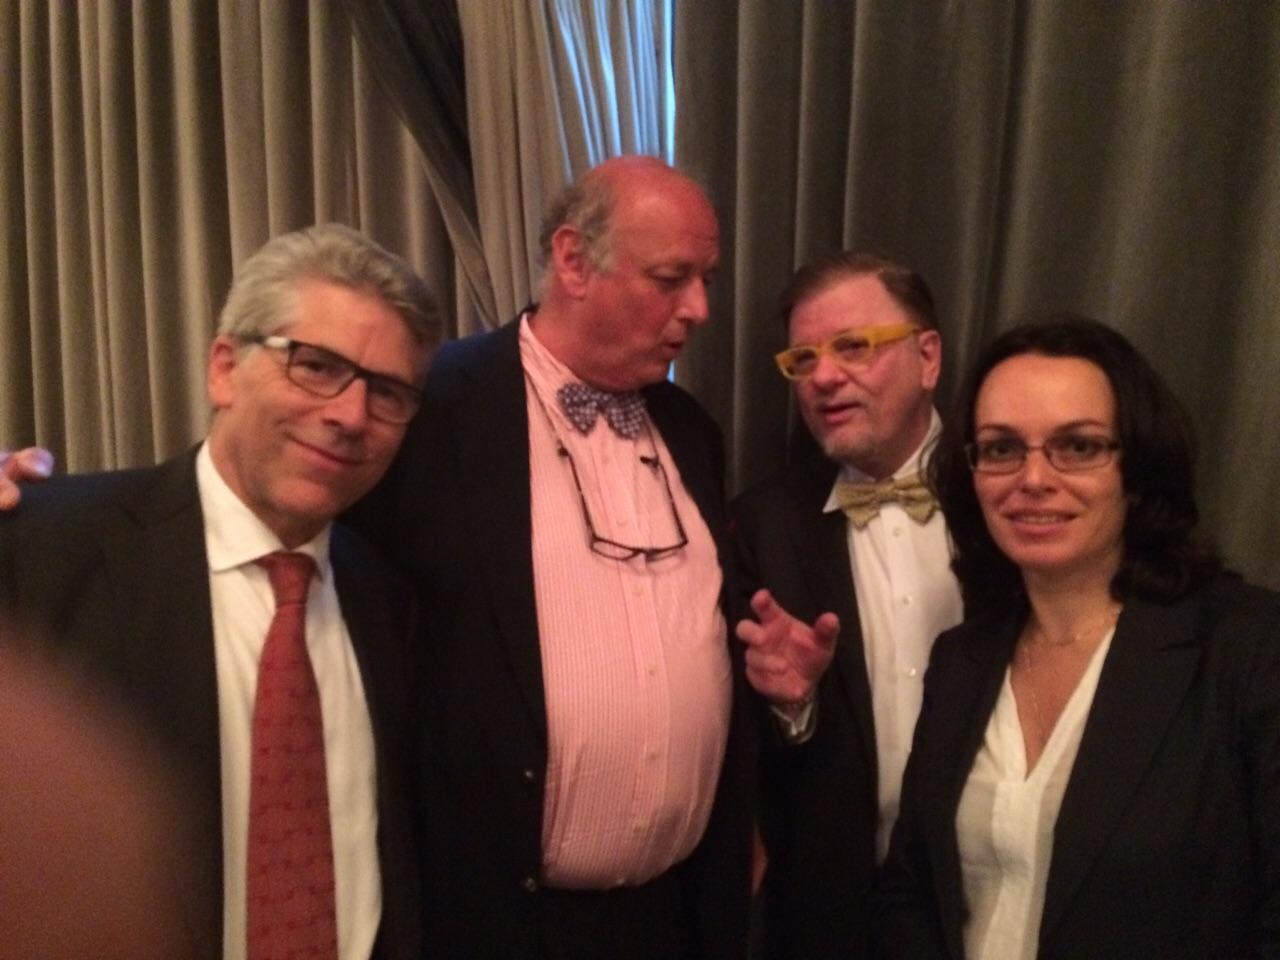 Участники конгресса (слева направо): P. Kestelyn (Бельгия), A. Hommer (Австрия), C. Herbort (Швейцария), Э.Н. Эскина (E.N. Eskina. Россия, Москва)